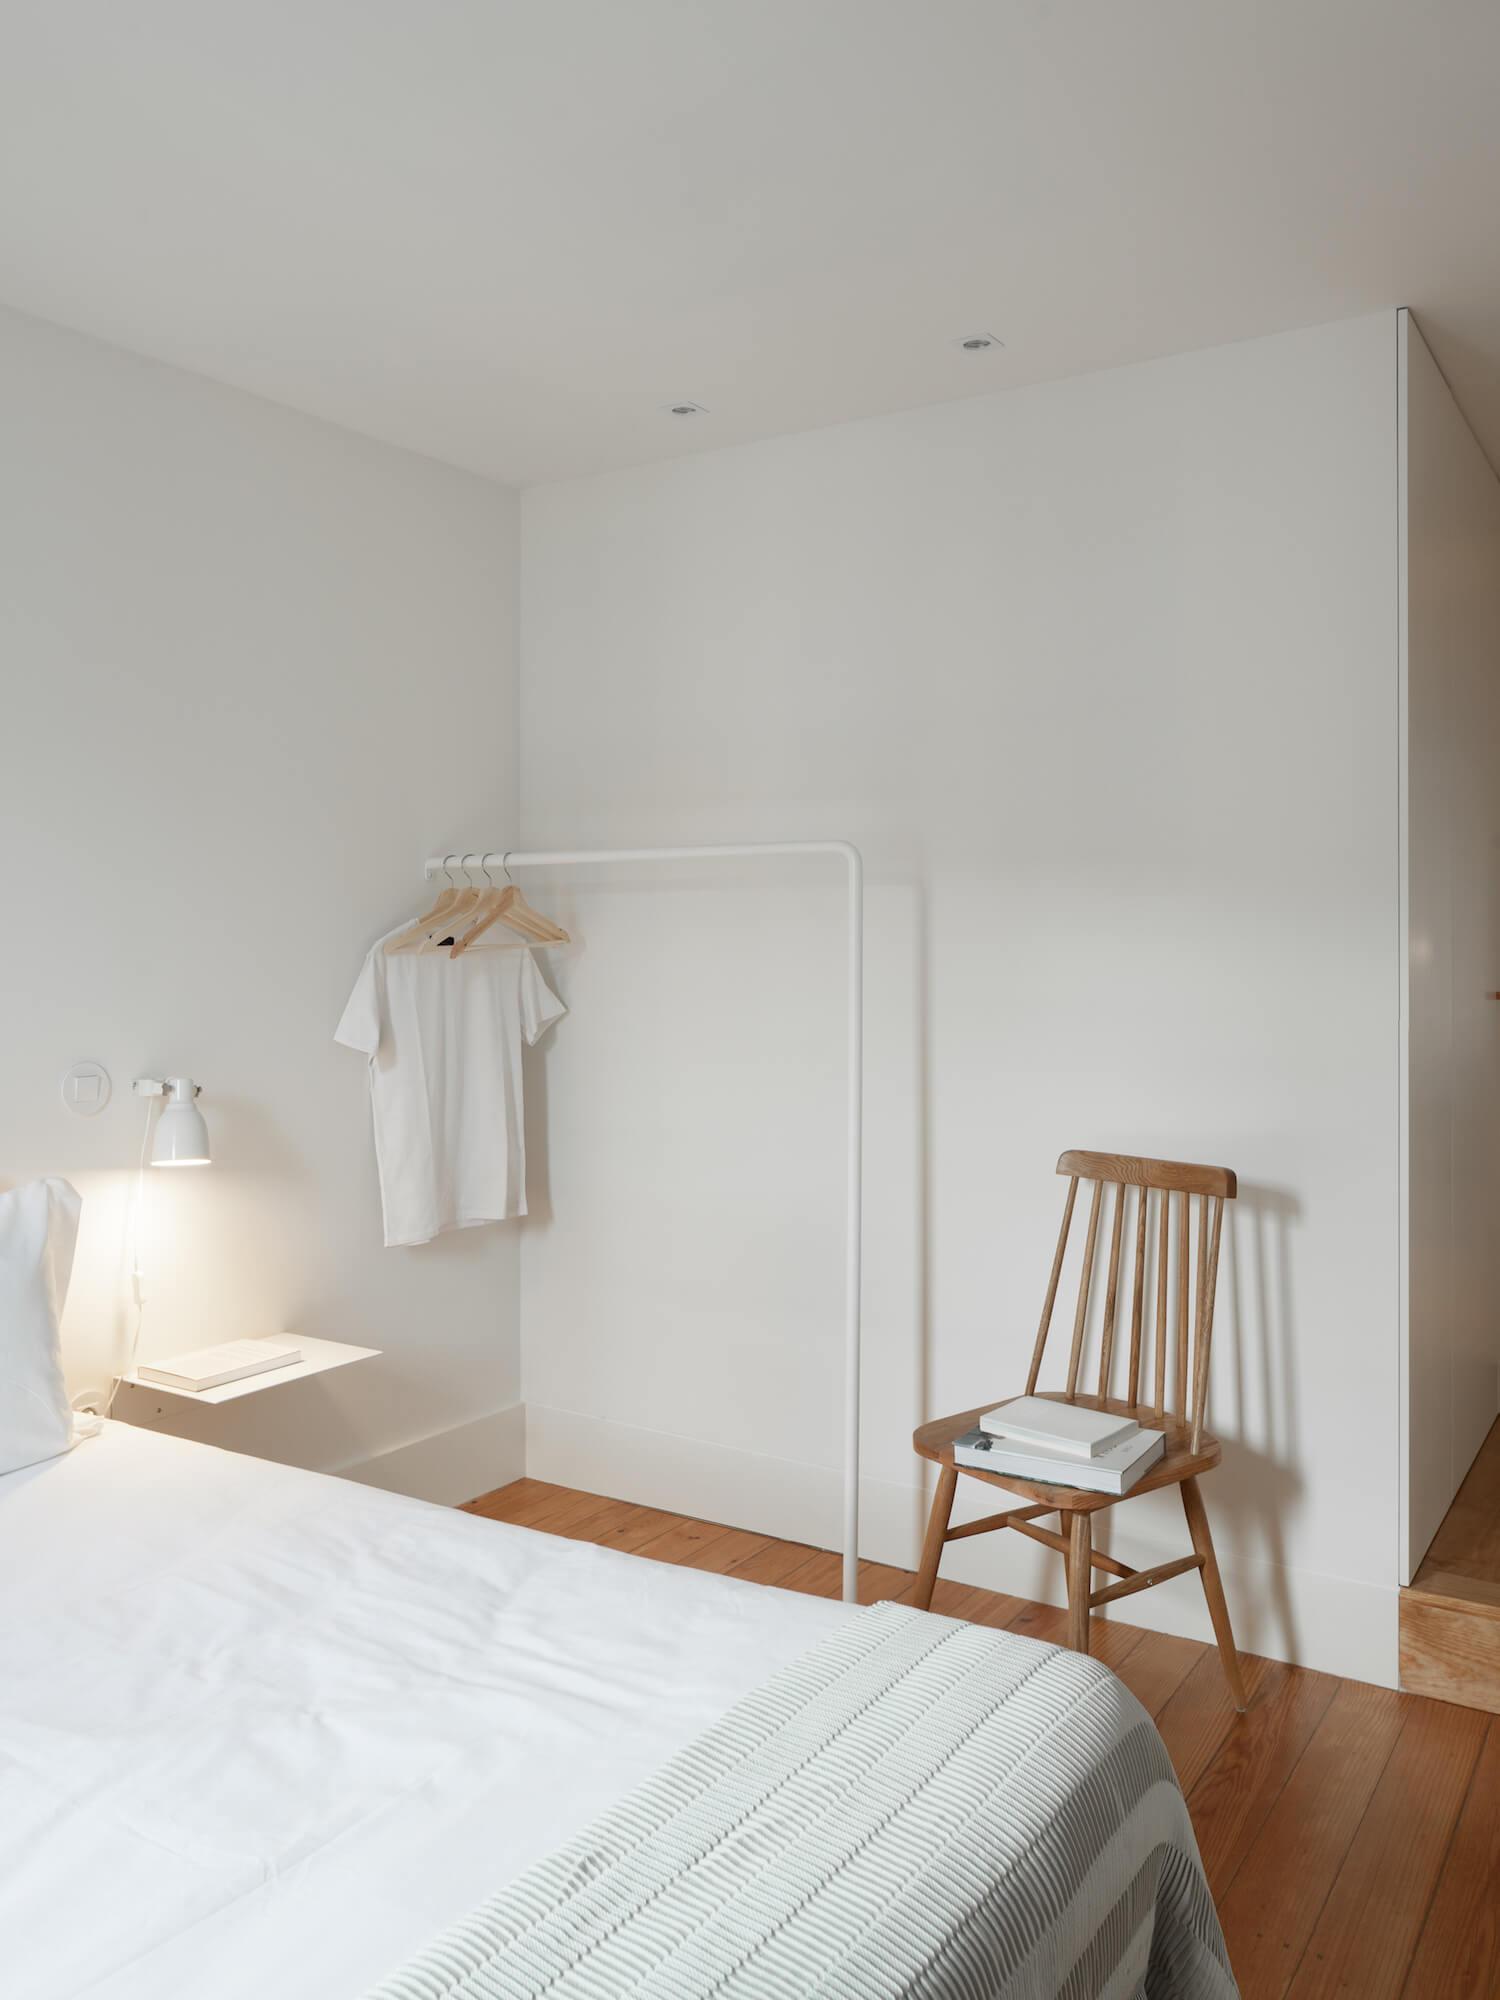 est living pablo pita firmeza apartment 9